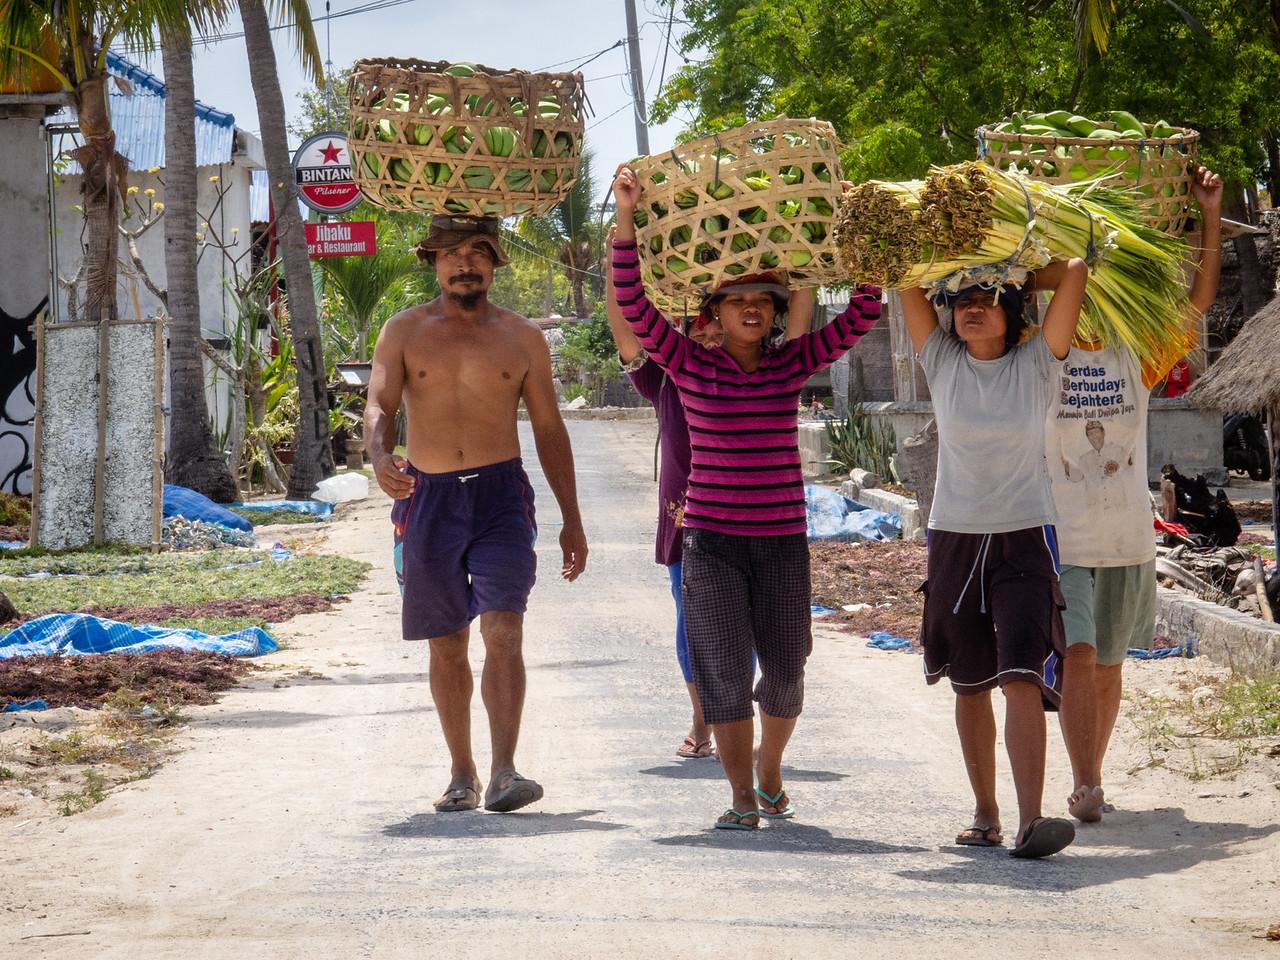 Farmers on Nusa Lembongan Taking Home Their Harvest of Papaya, Mangos and Lemongrass